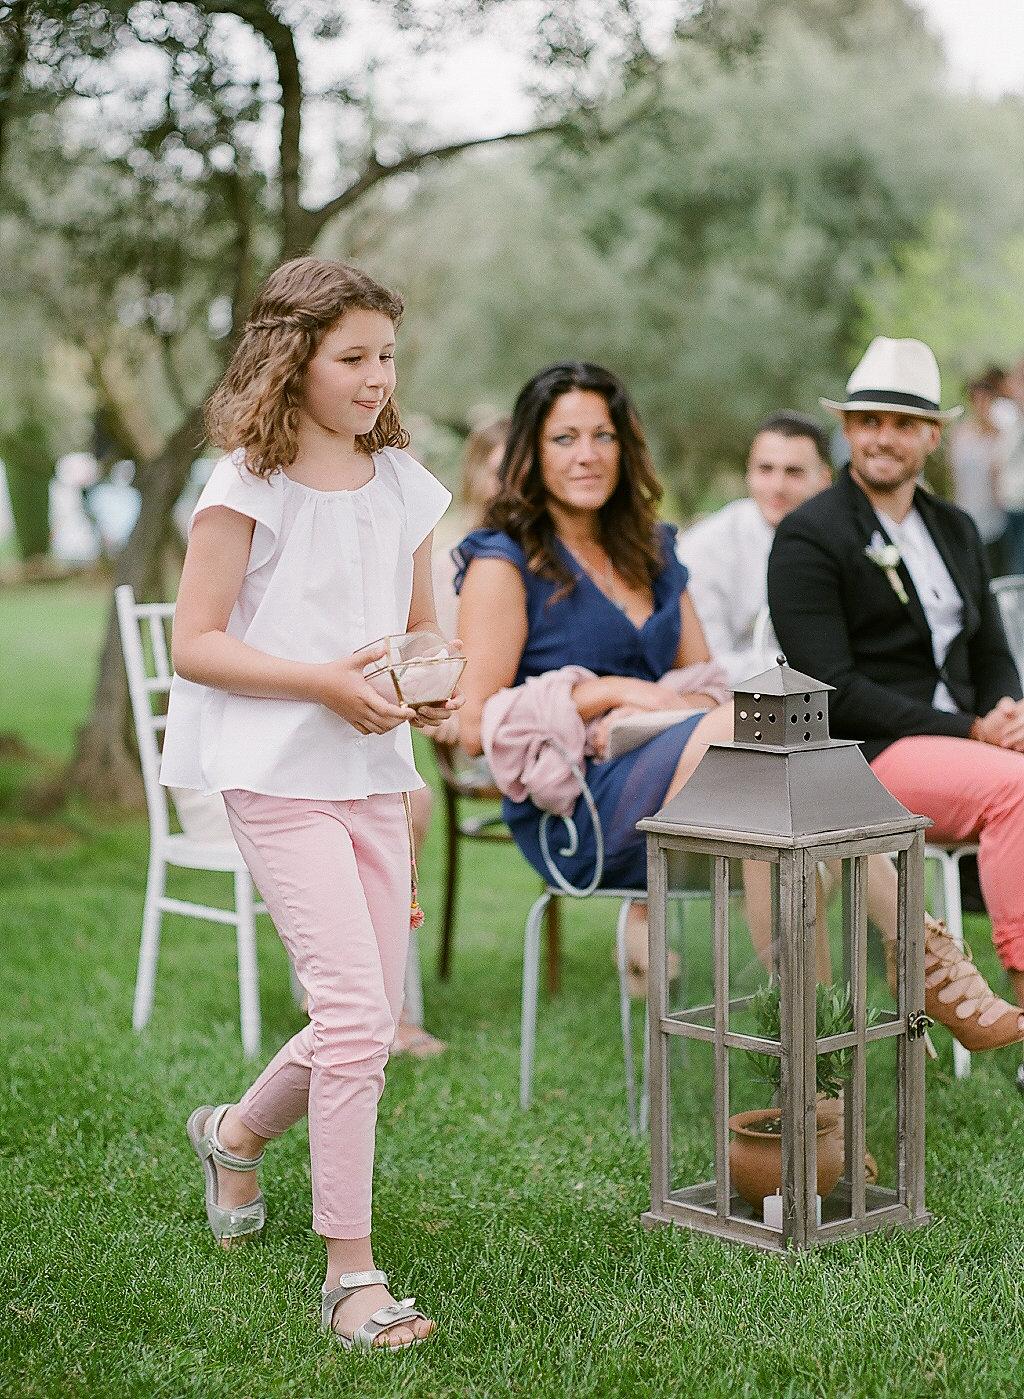 le coeur dans les etoiles - wedding planner - provence - luberon - alpilles - drome - vaucluse - sardaigne - italie - organisation - mariage - shooting - dolce vita - valery villard-295